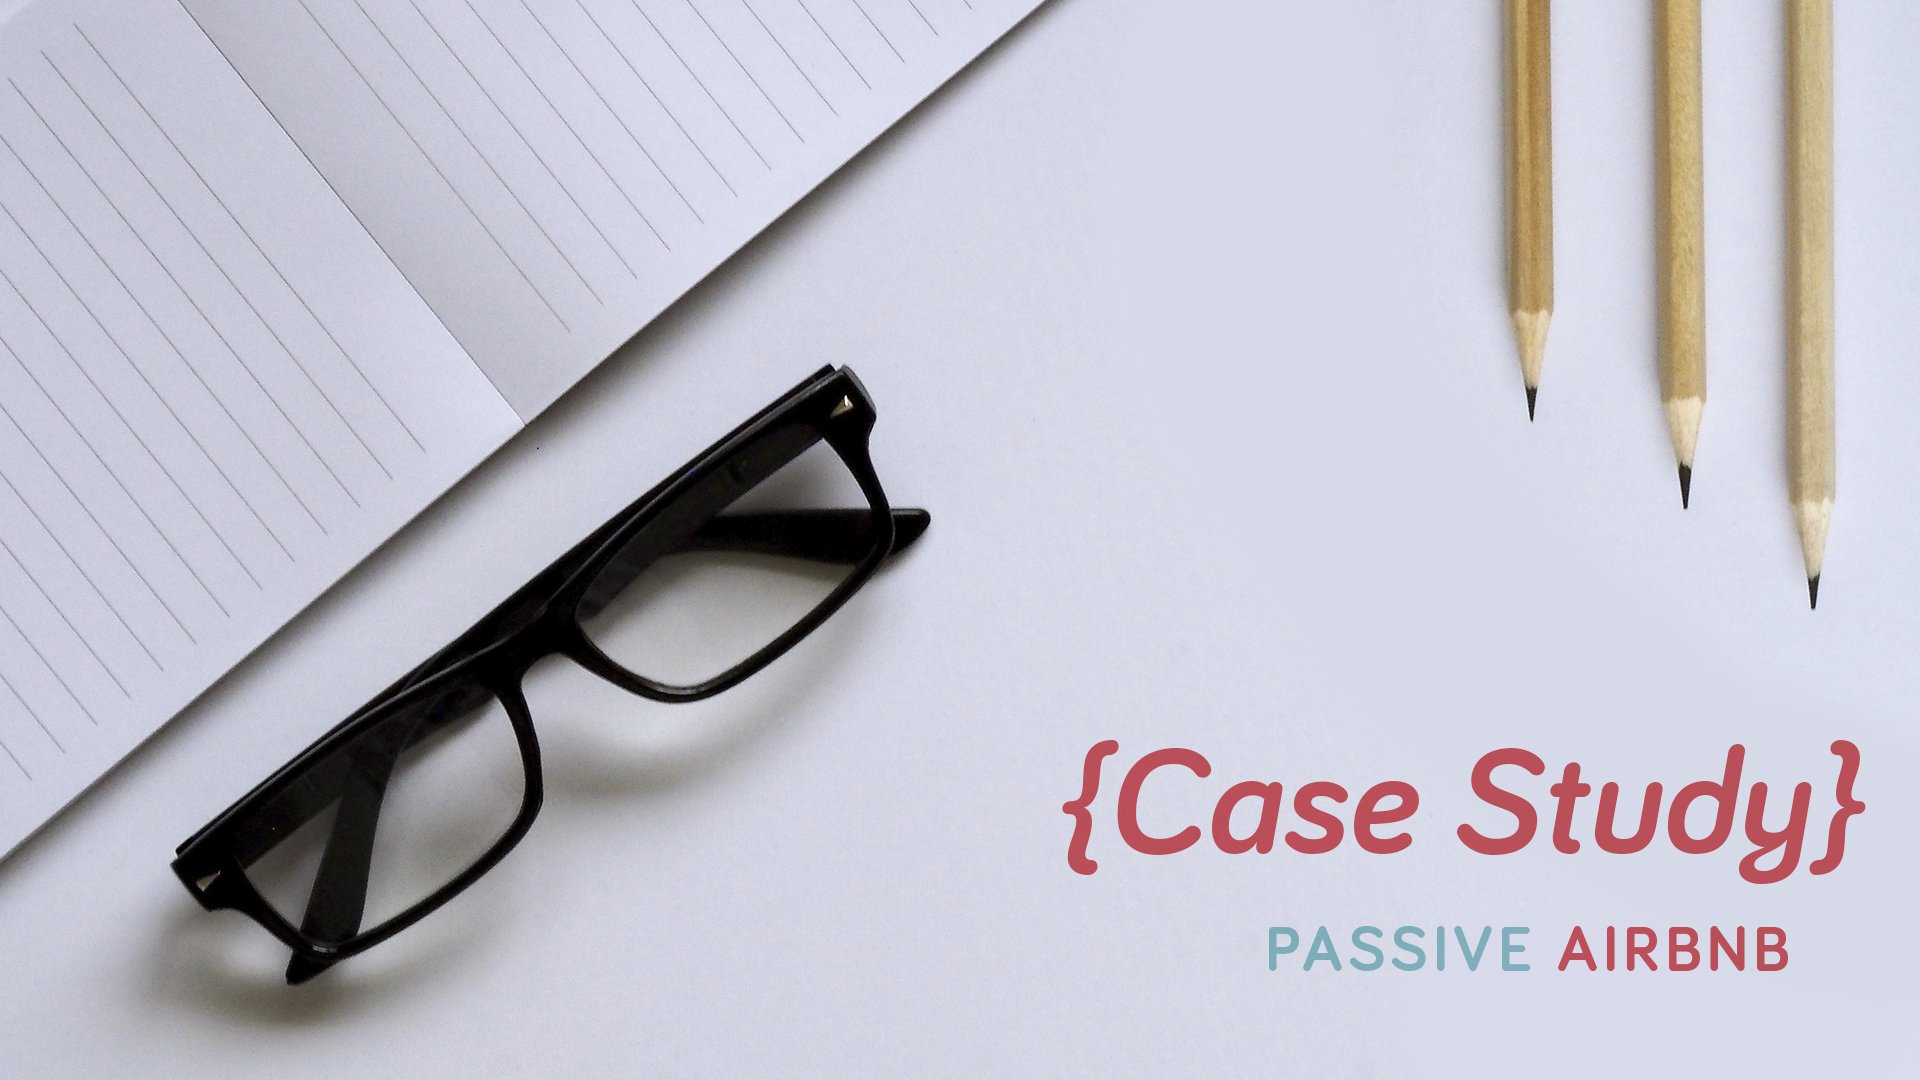 passive airbnb case study